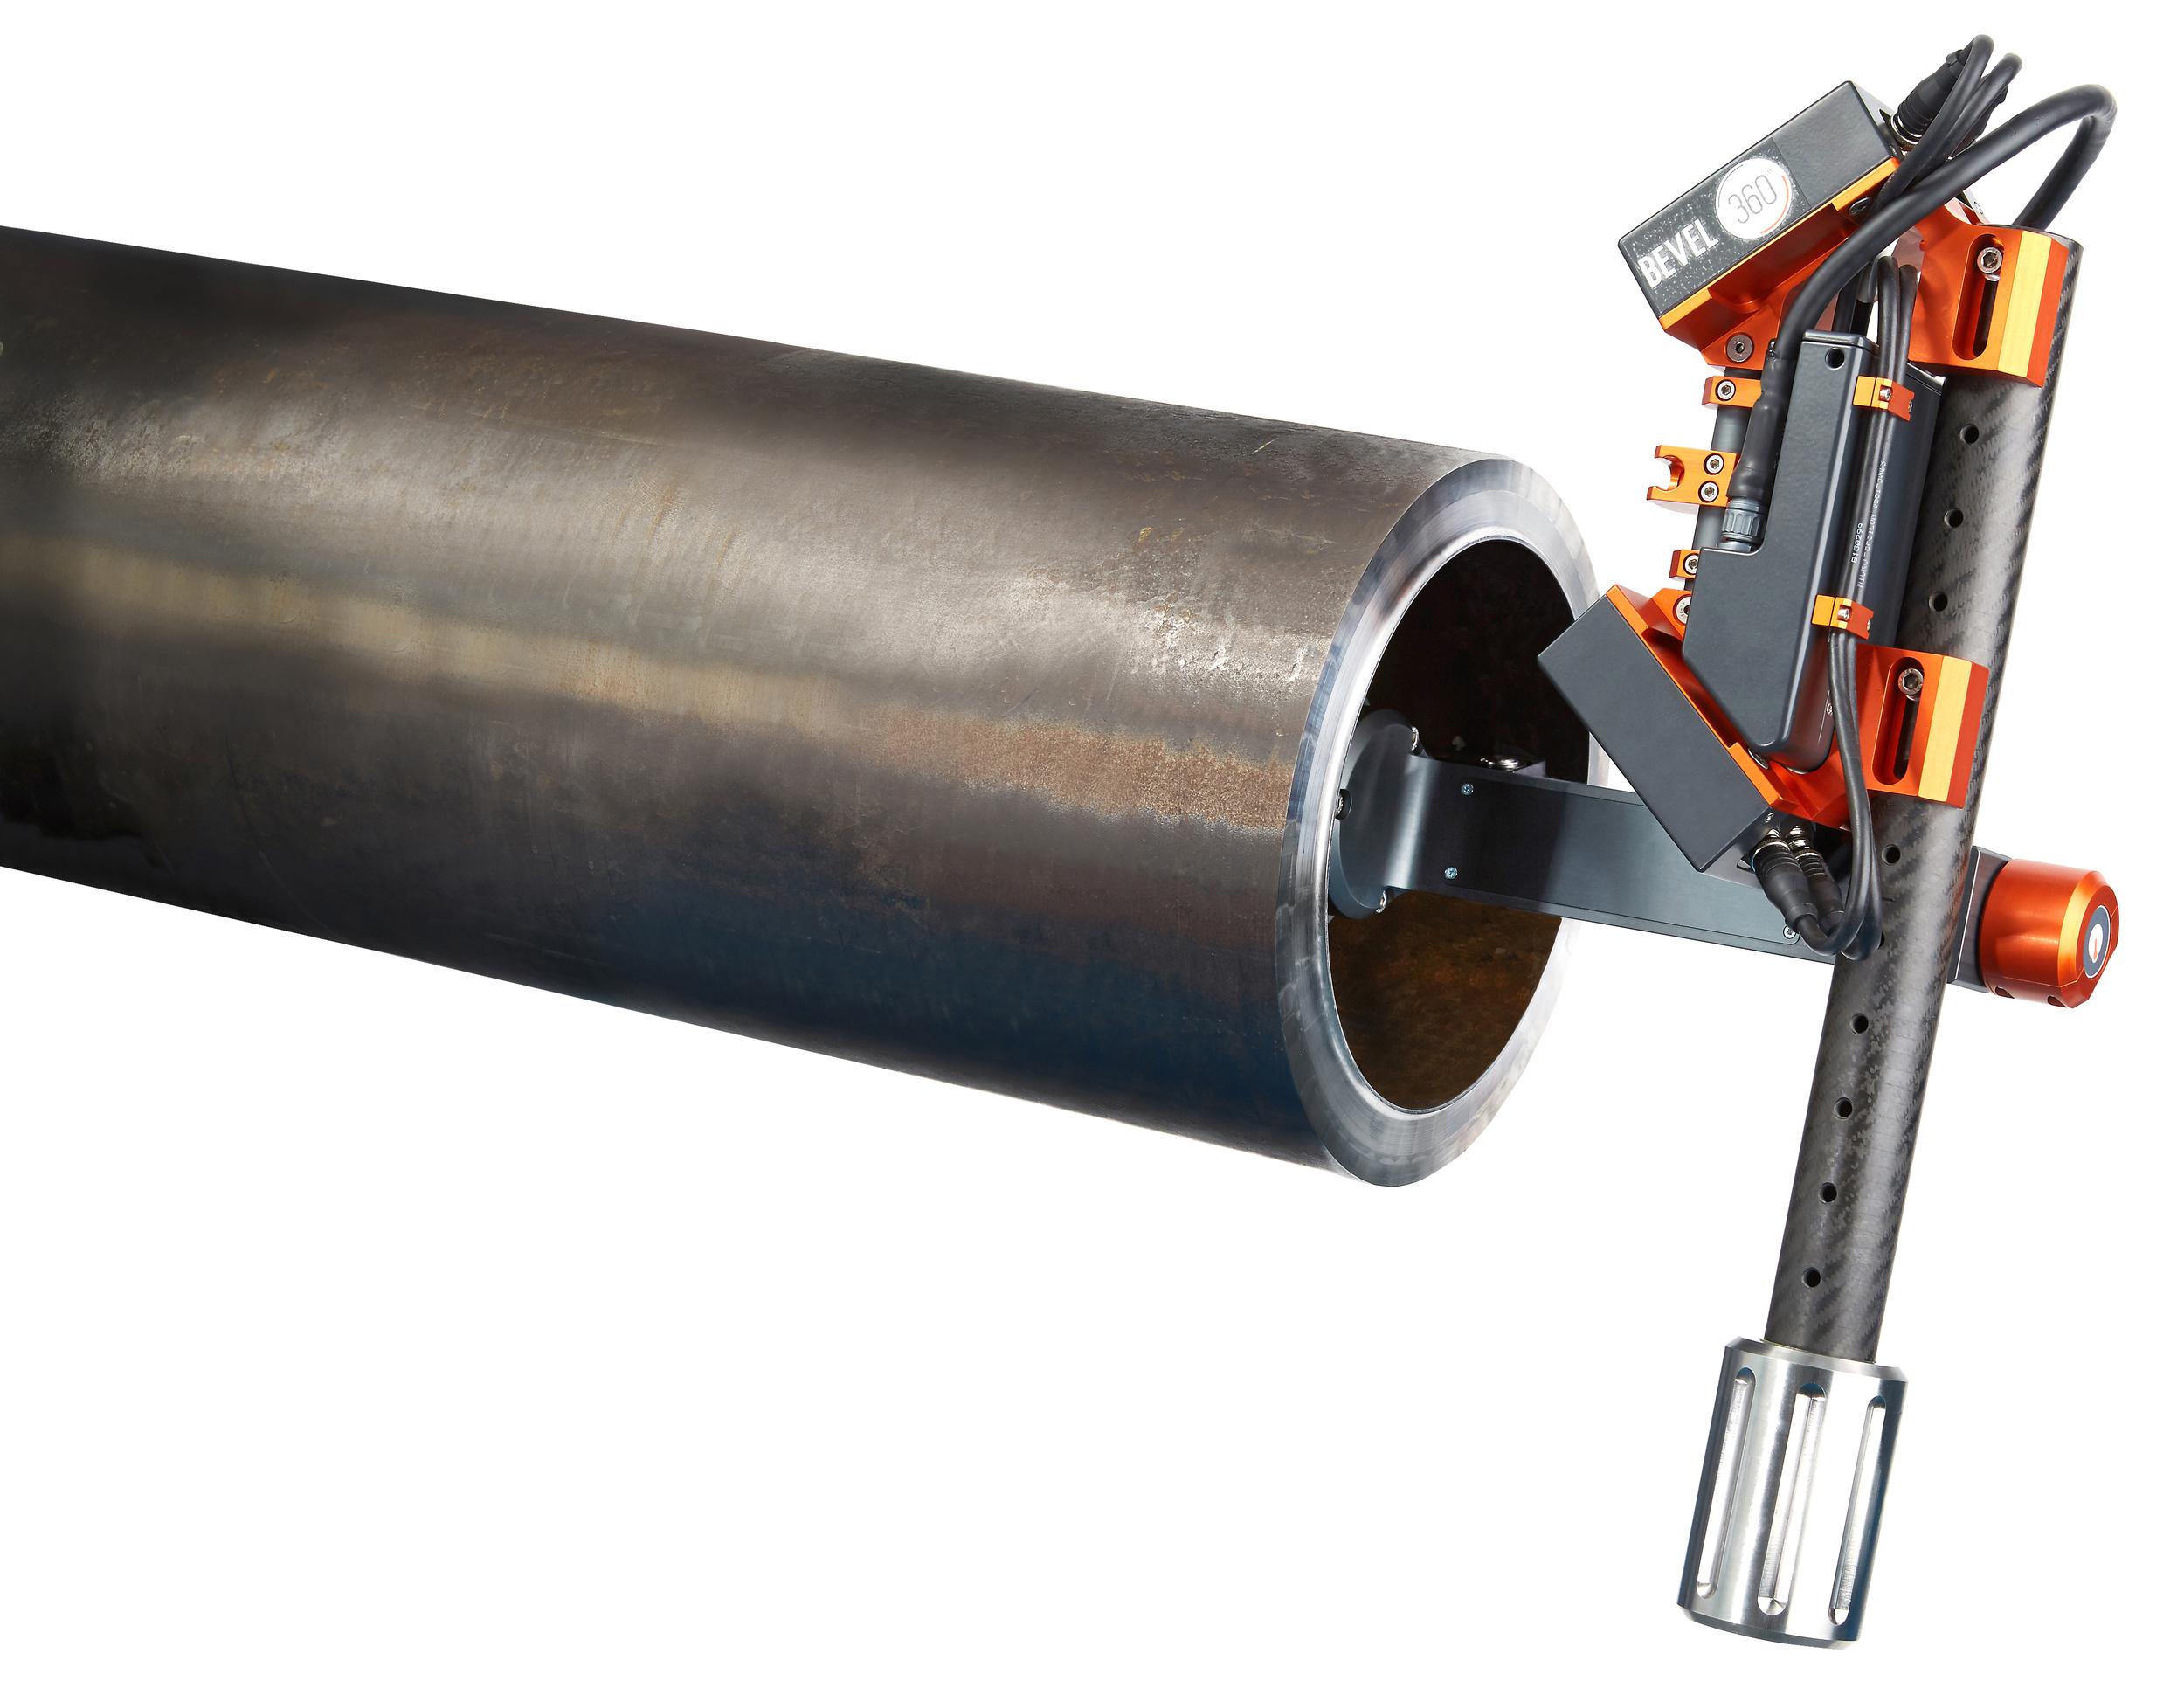 Bevel360-tool-in-pipe-angled.jpg